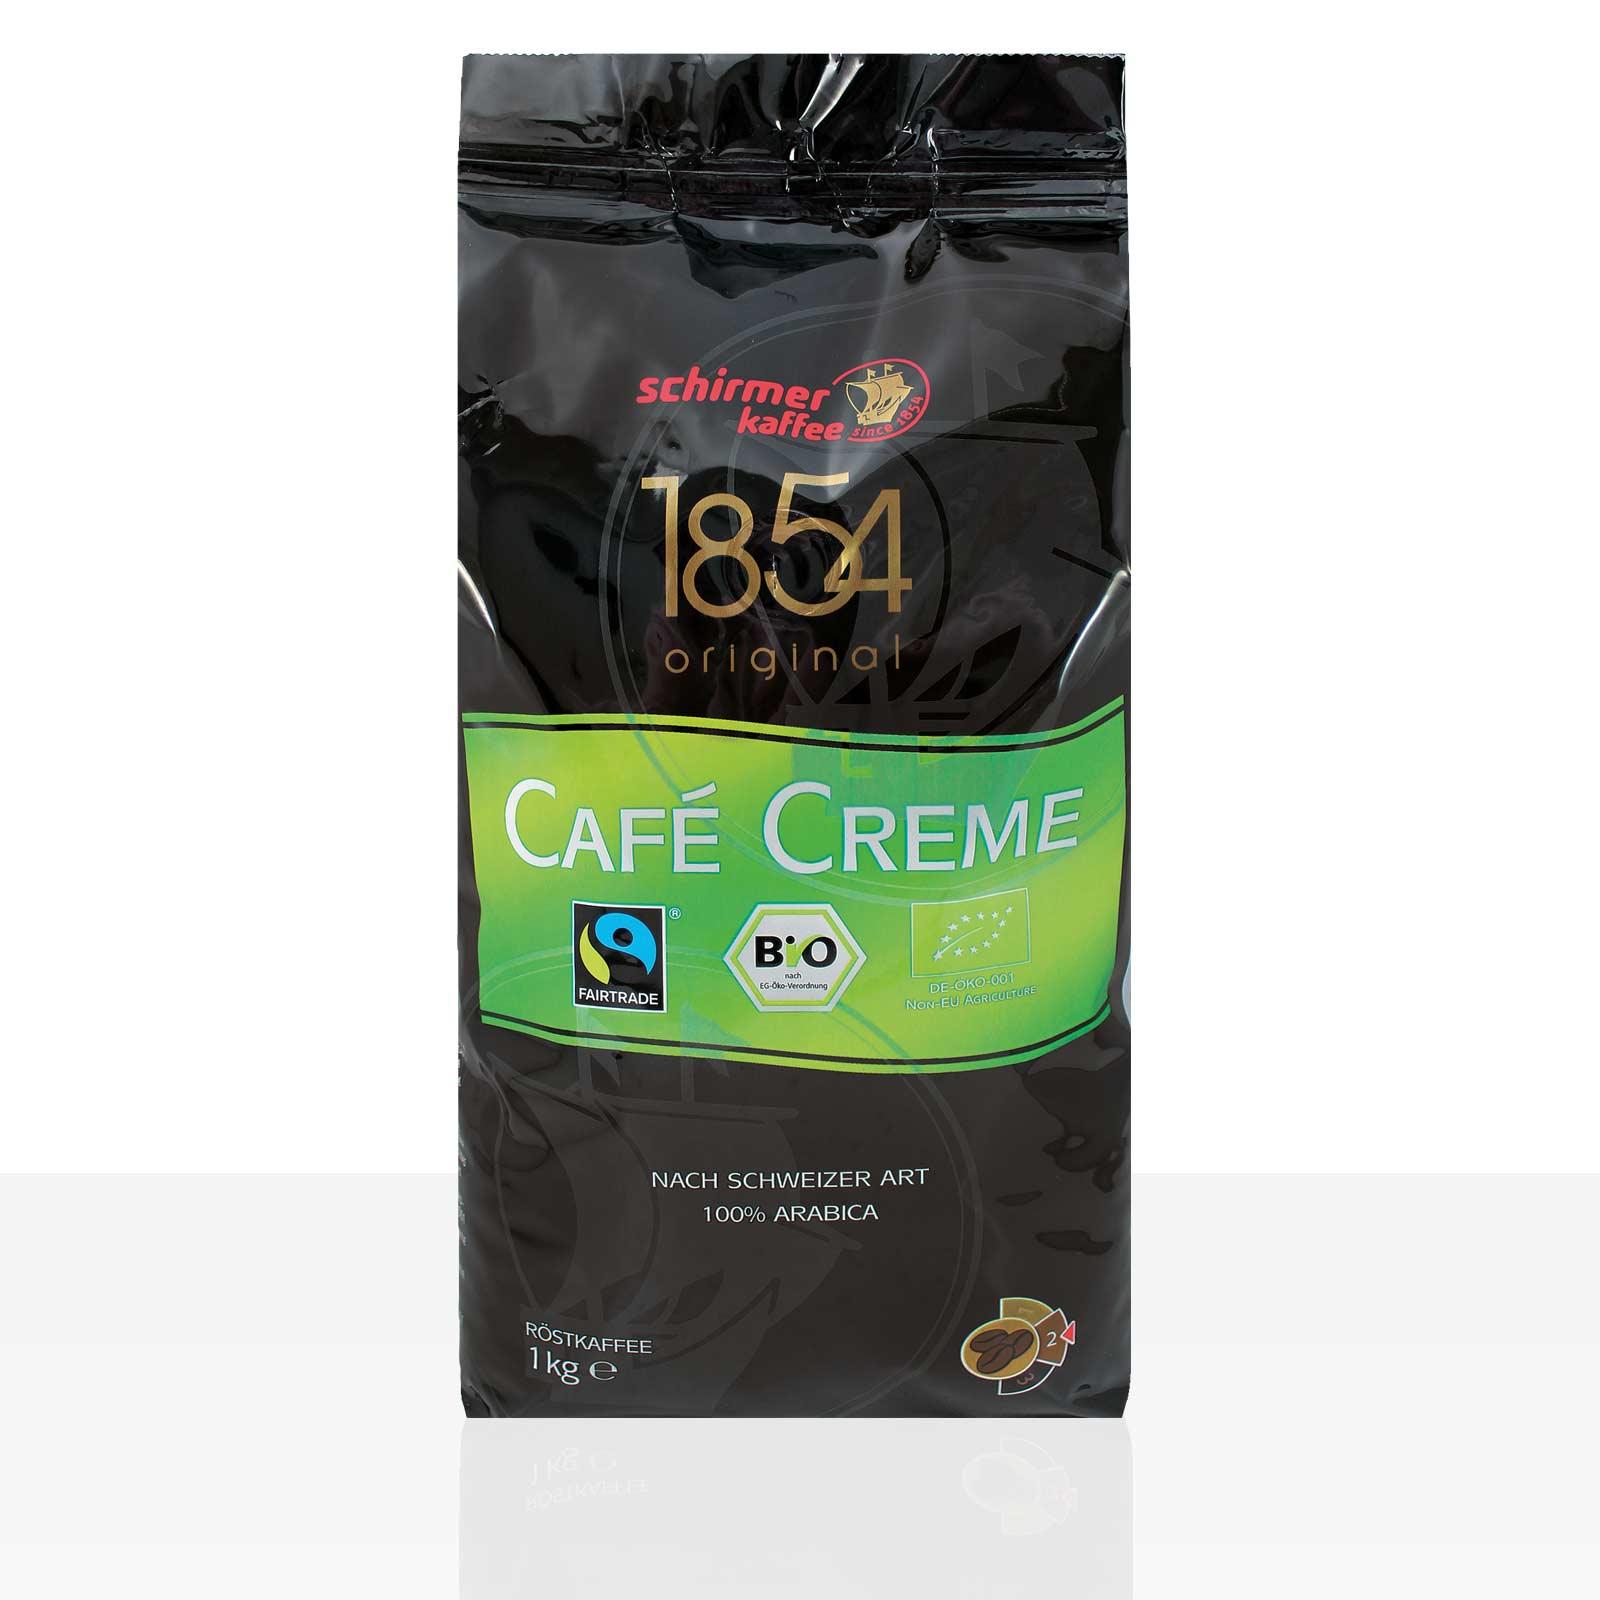 Schirmer Cafe Creme 1854 Bio Fairtrade - 8 x 1kg Kaffee ganze Bohne, 100% Arabica